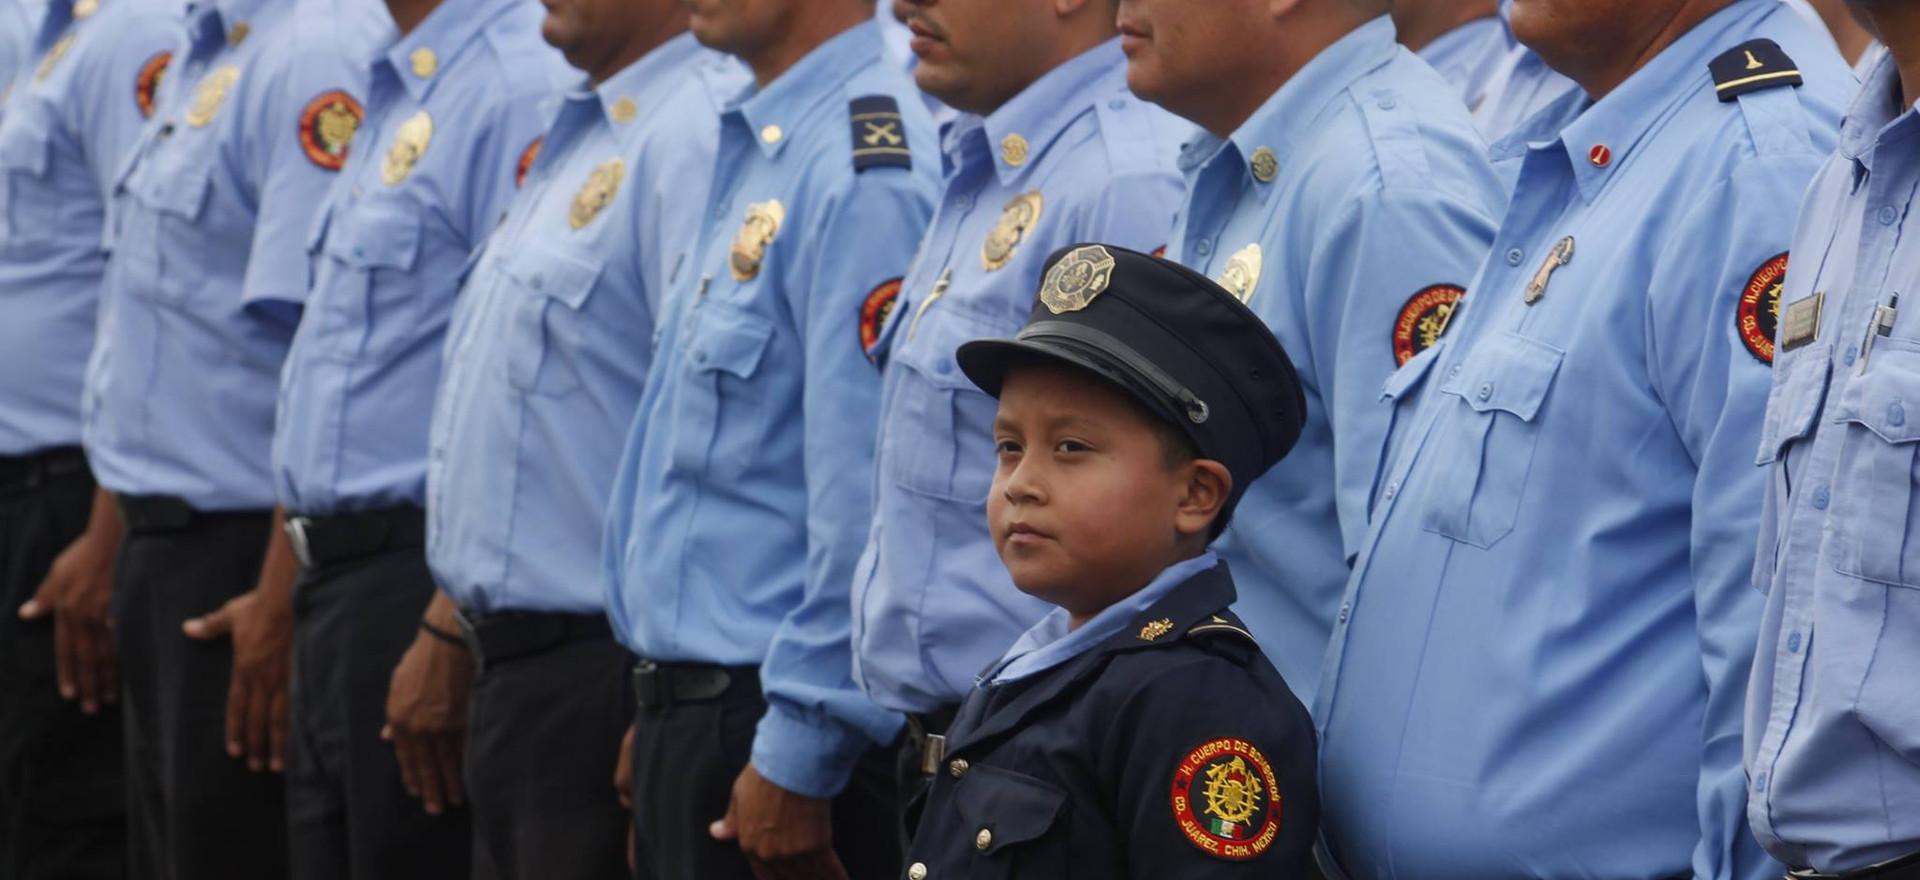 El niño bombero